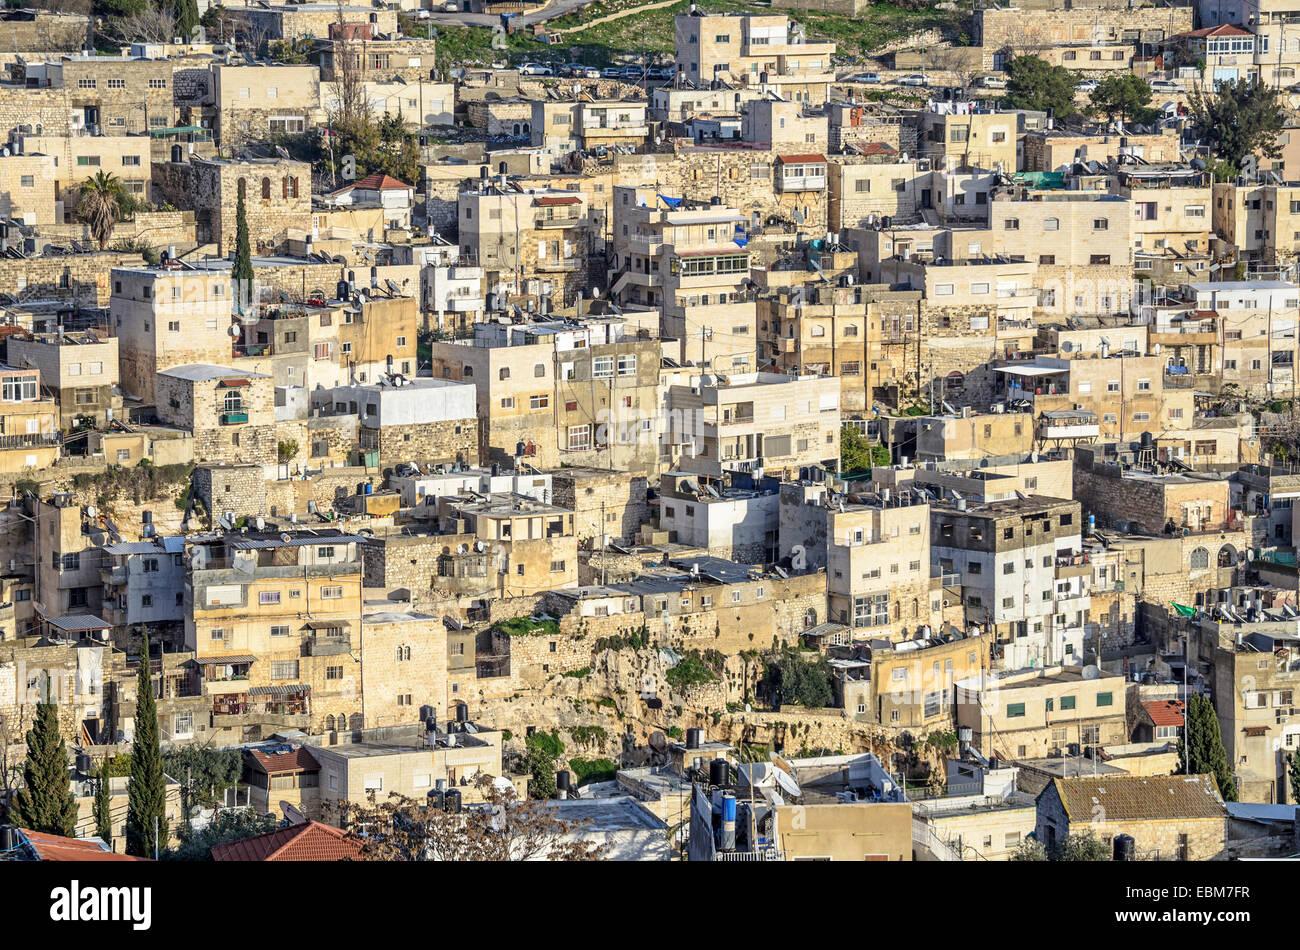 Jerusalem, Israel hillside homes near the old city. - Stock Image